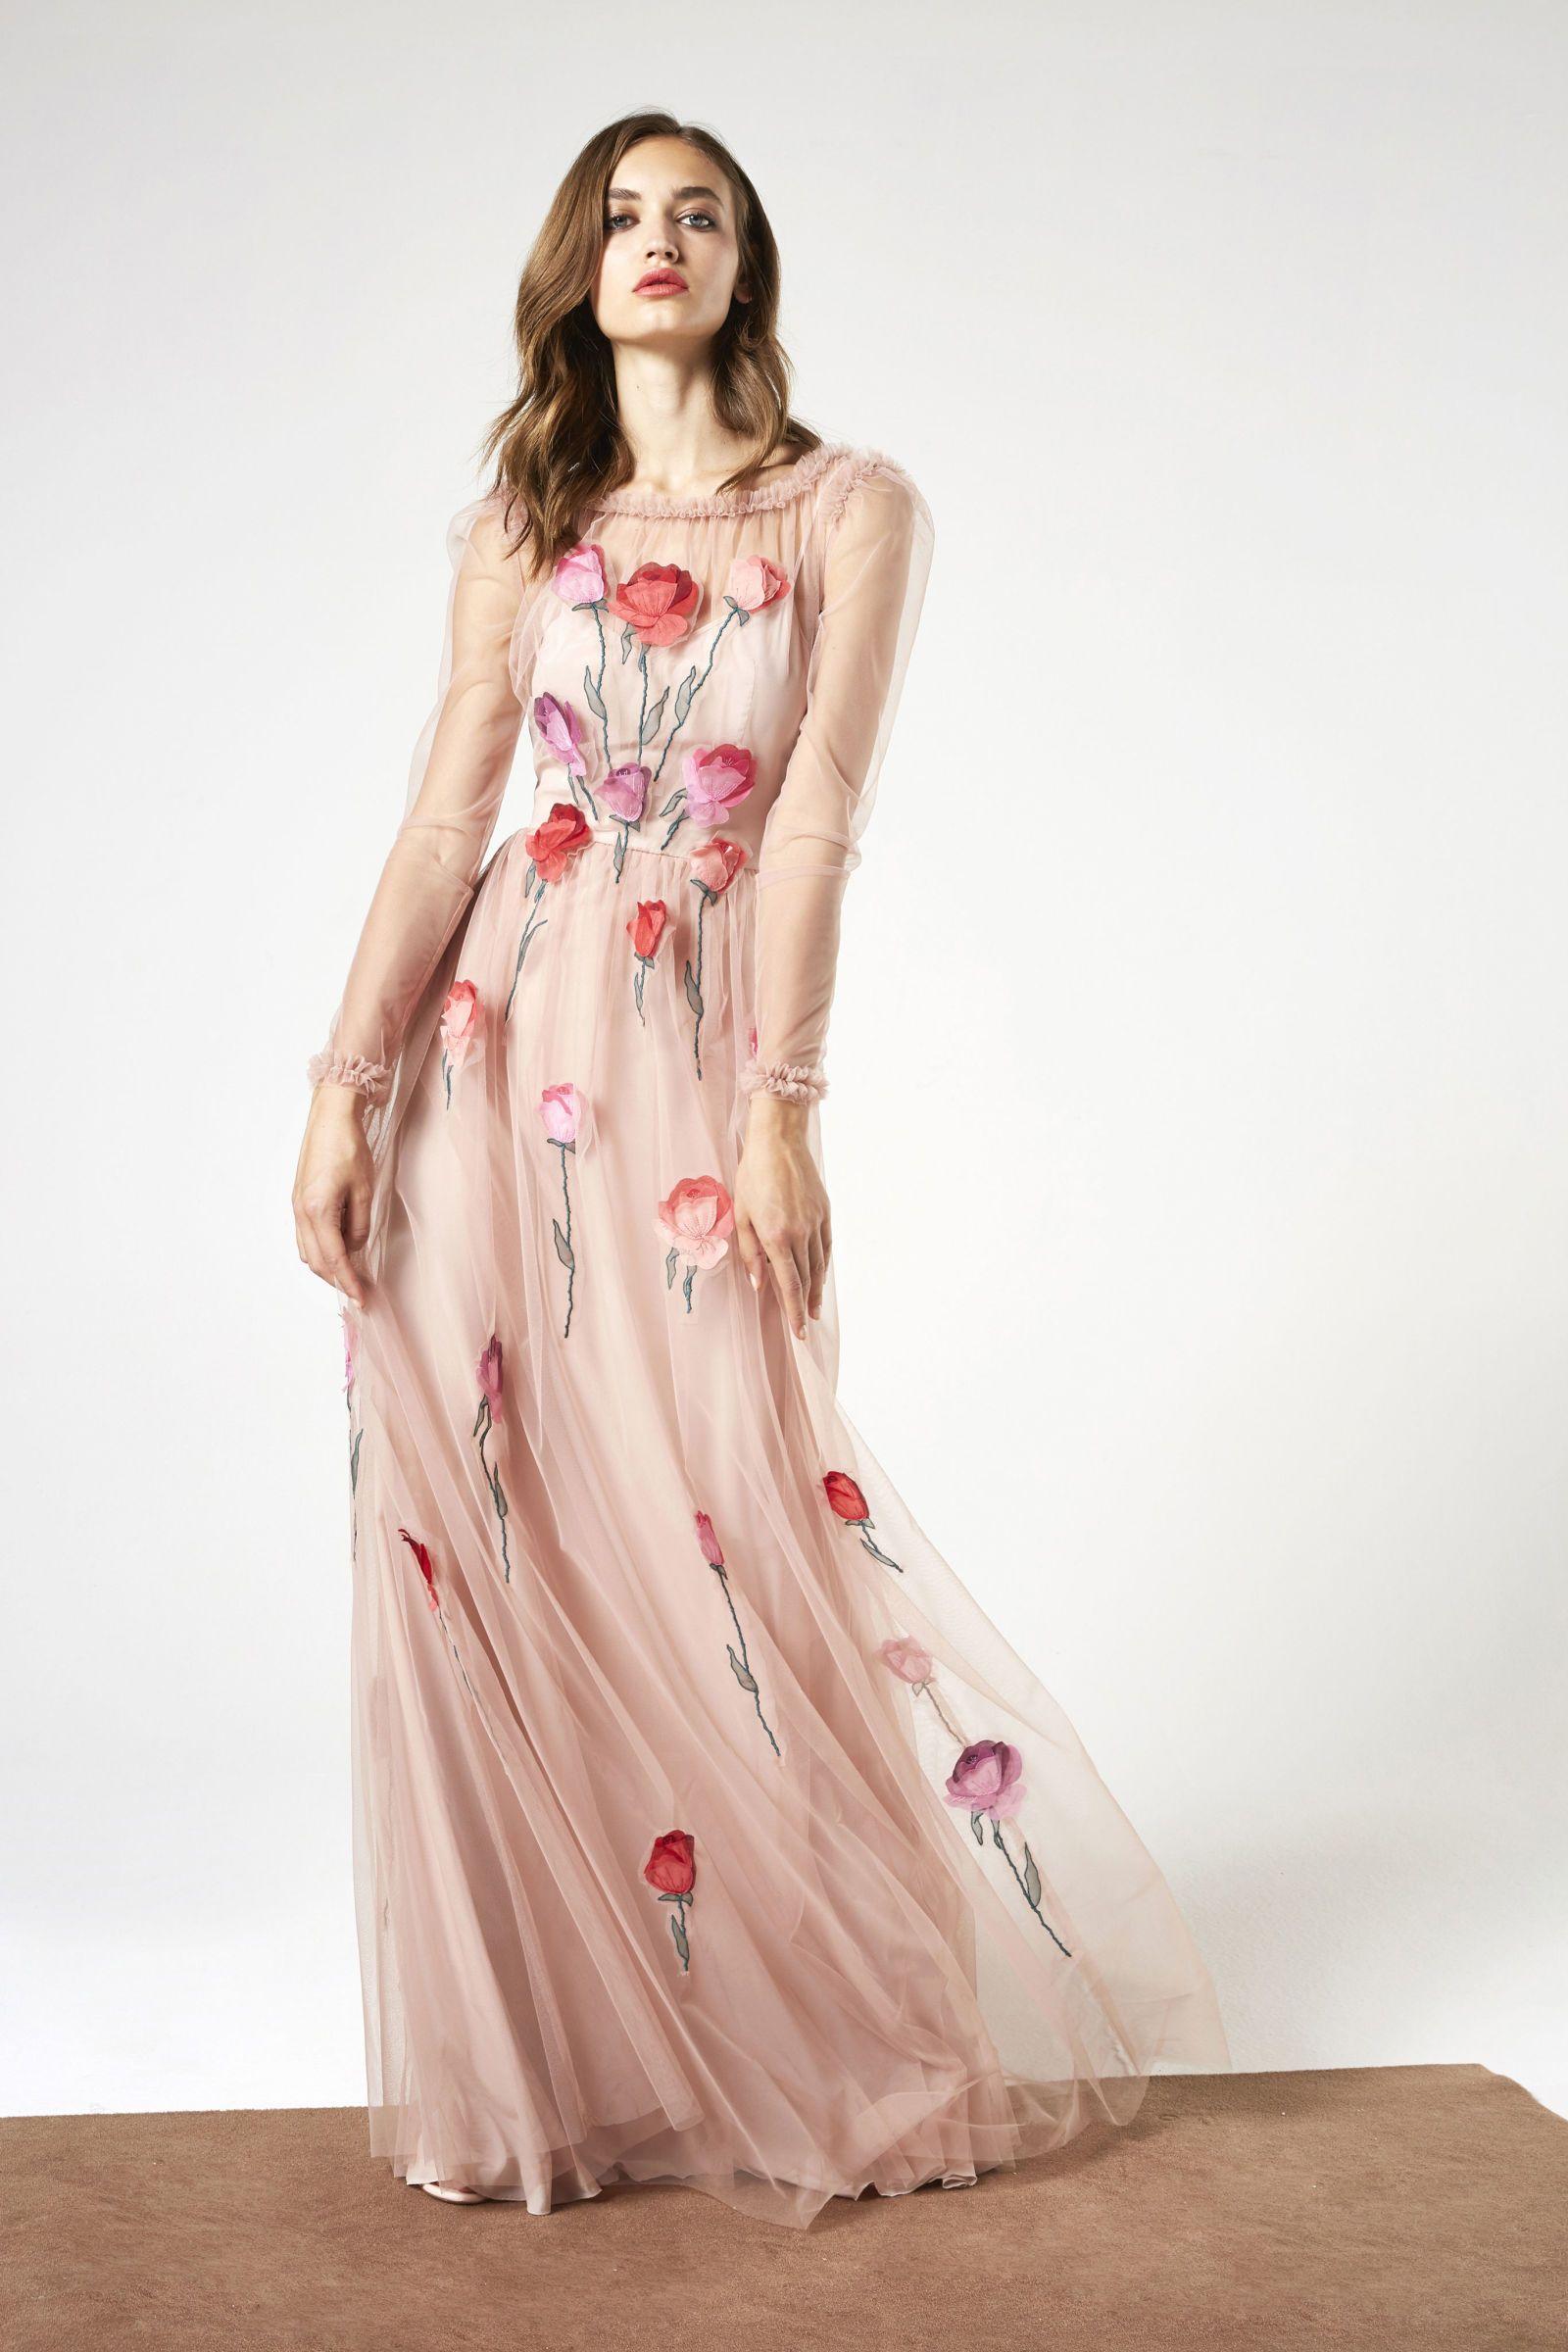 617f003ae Blumarine Resort 2018 | Gowns | Fashion, Rose gown, Floral fashion